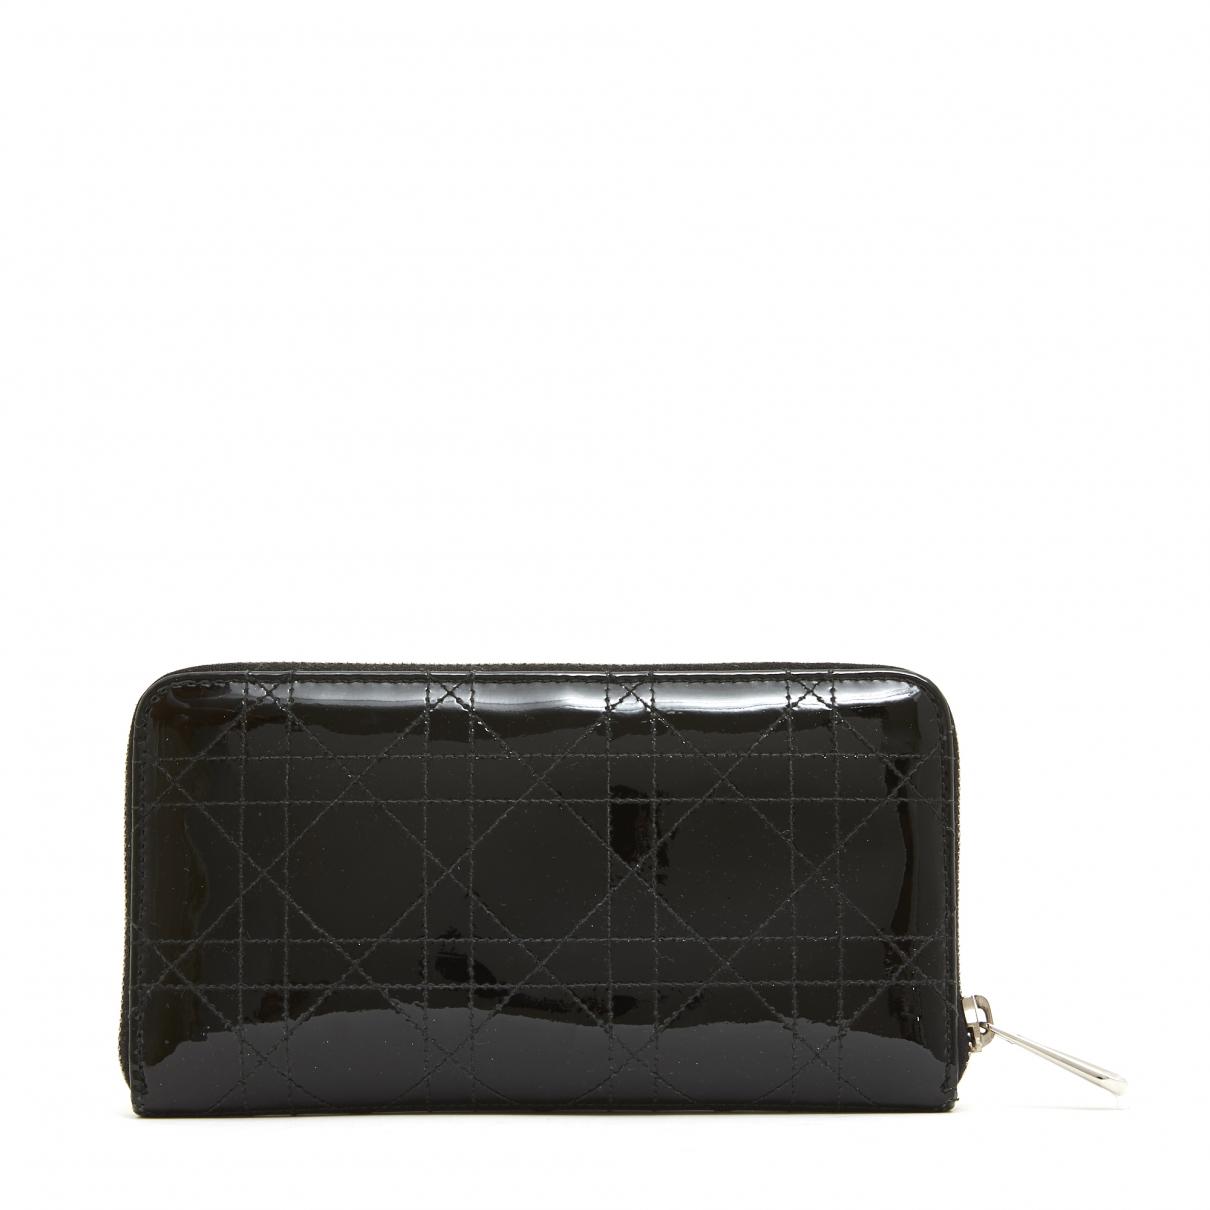 Christian Dior \N Portemonnaie in  Schwarz Lackleder